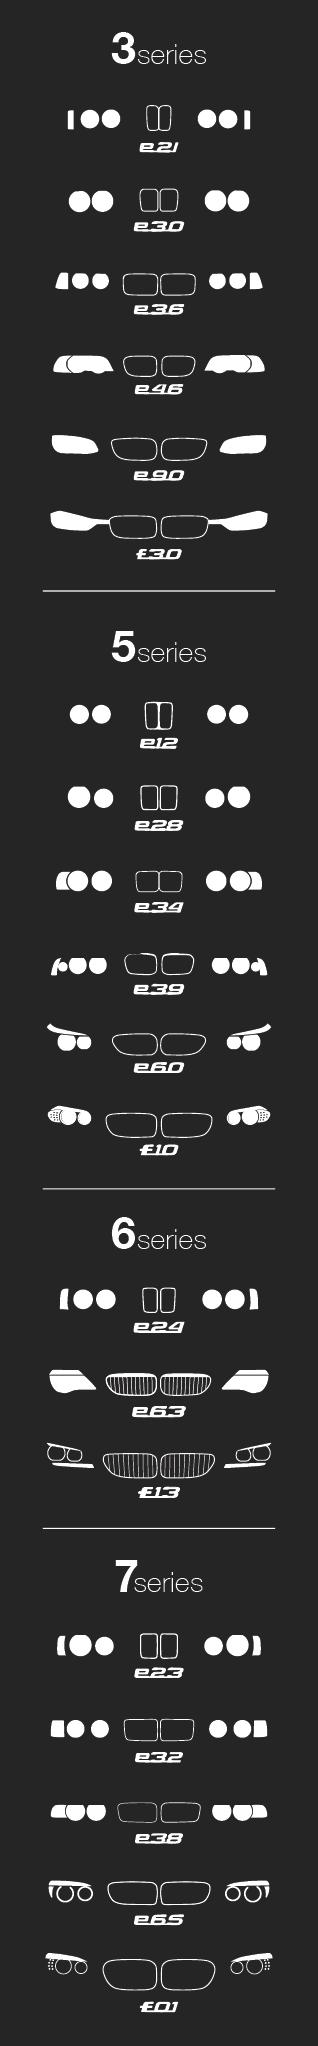 The Evolution of the BMW 3, 5, 6, and 7 Series' Headlight and Kidney Grill Design. Available as a shirt, poster, iPhone case and more. Featuring the e21, e30, e36, e46, e90, f30, e24, e63, f13, e23, e32, e38, e65, f01, e39, e60, f10, e61